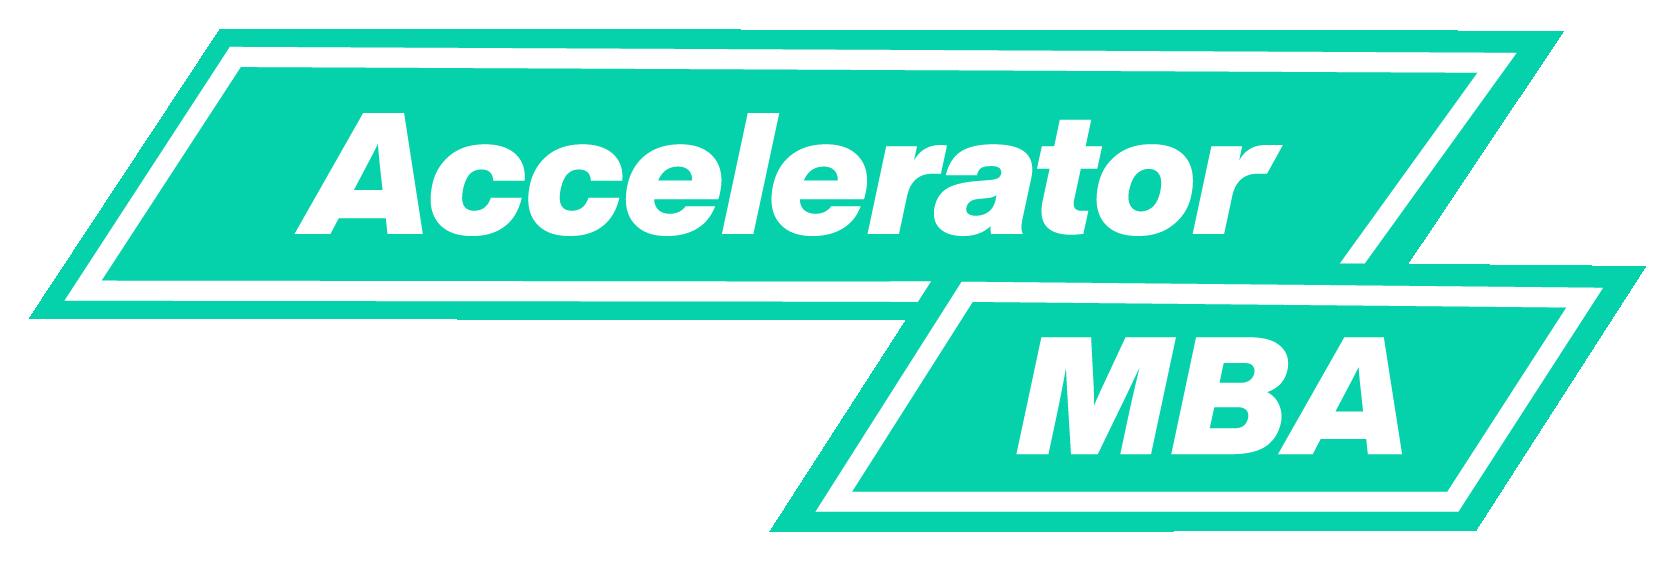 Accelerator MBA